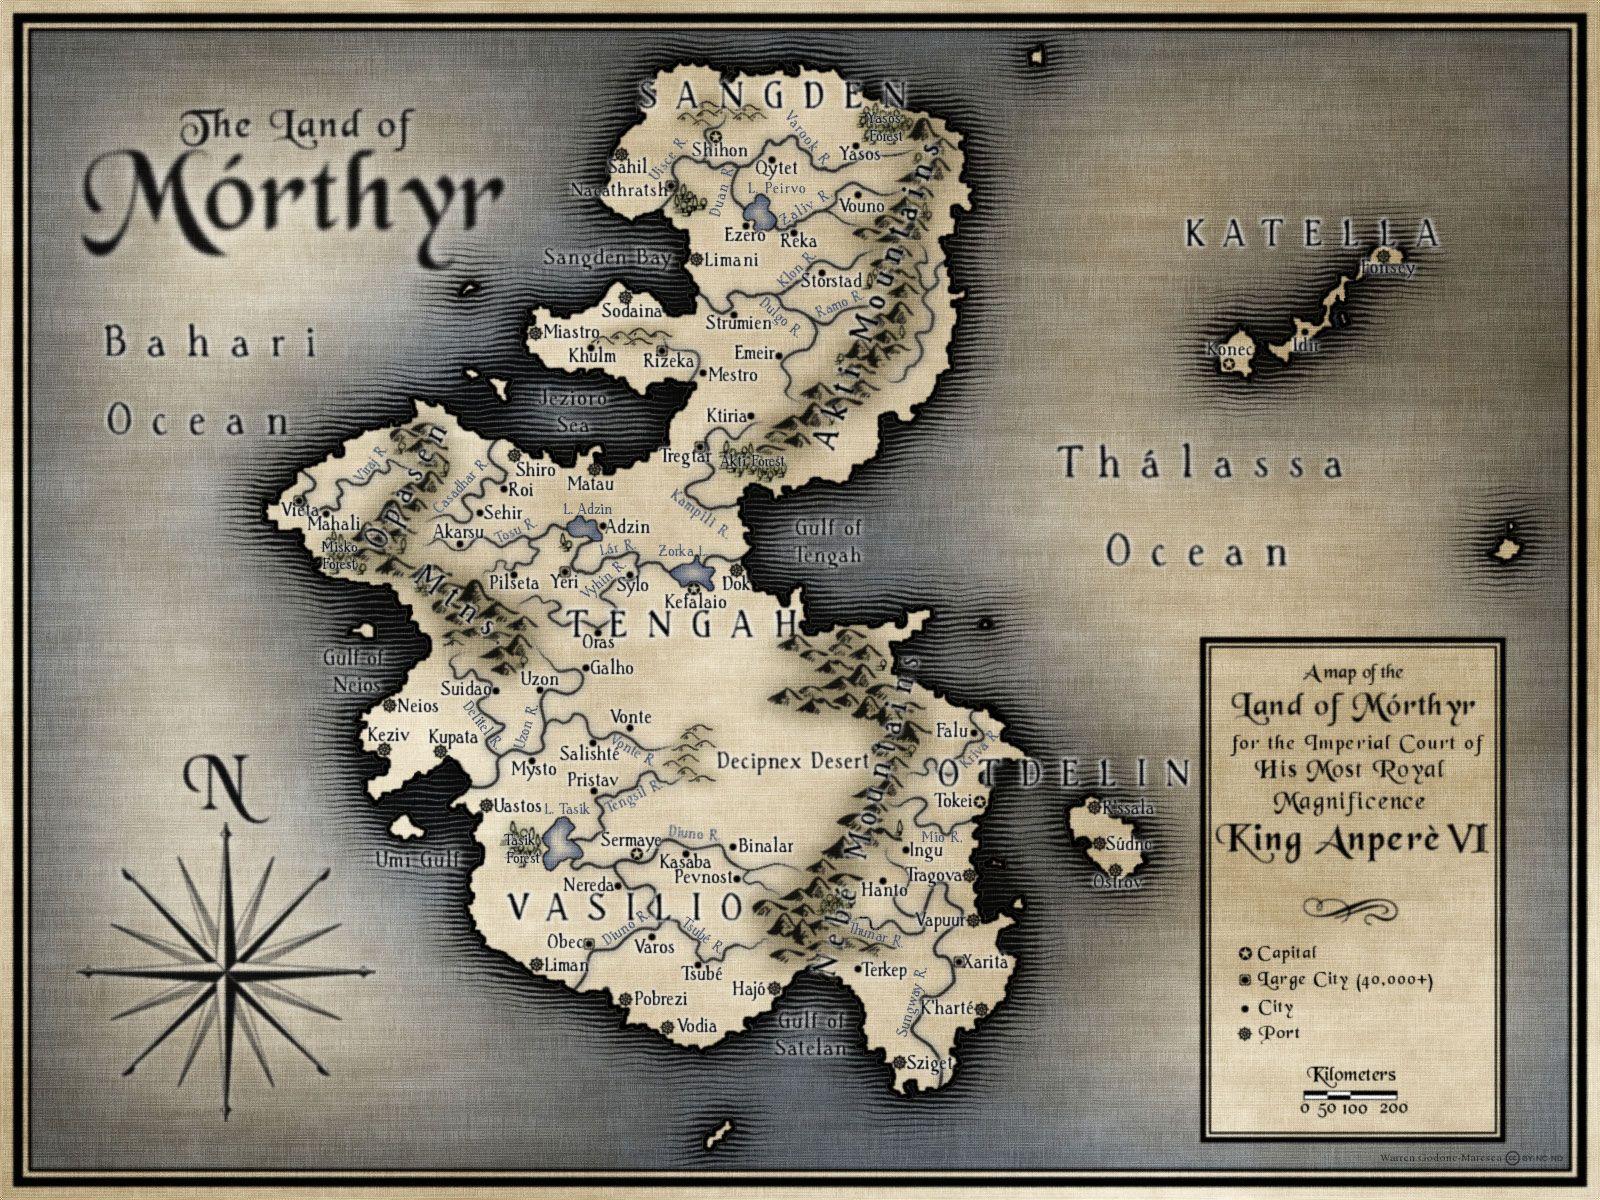 The Land of Mórthyr, by Warren Godone-Maresca